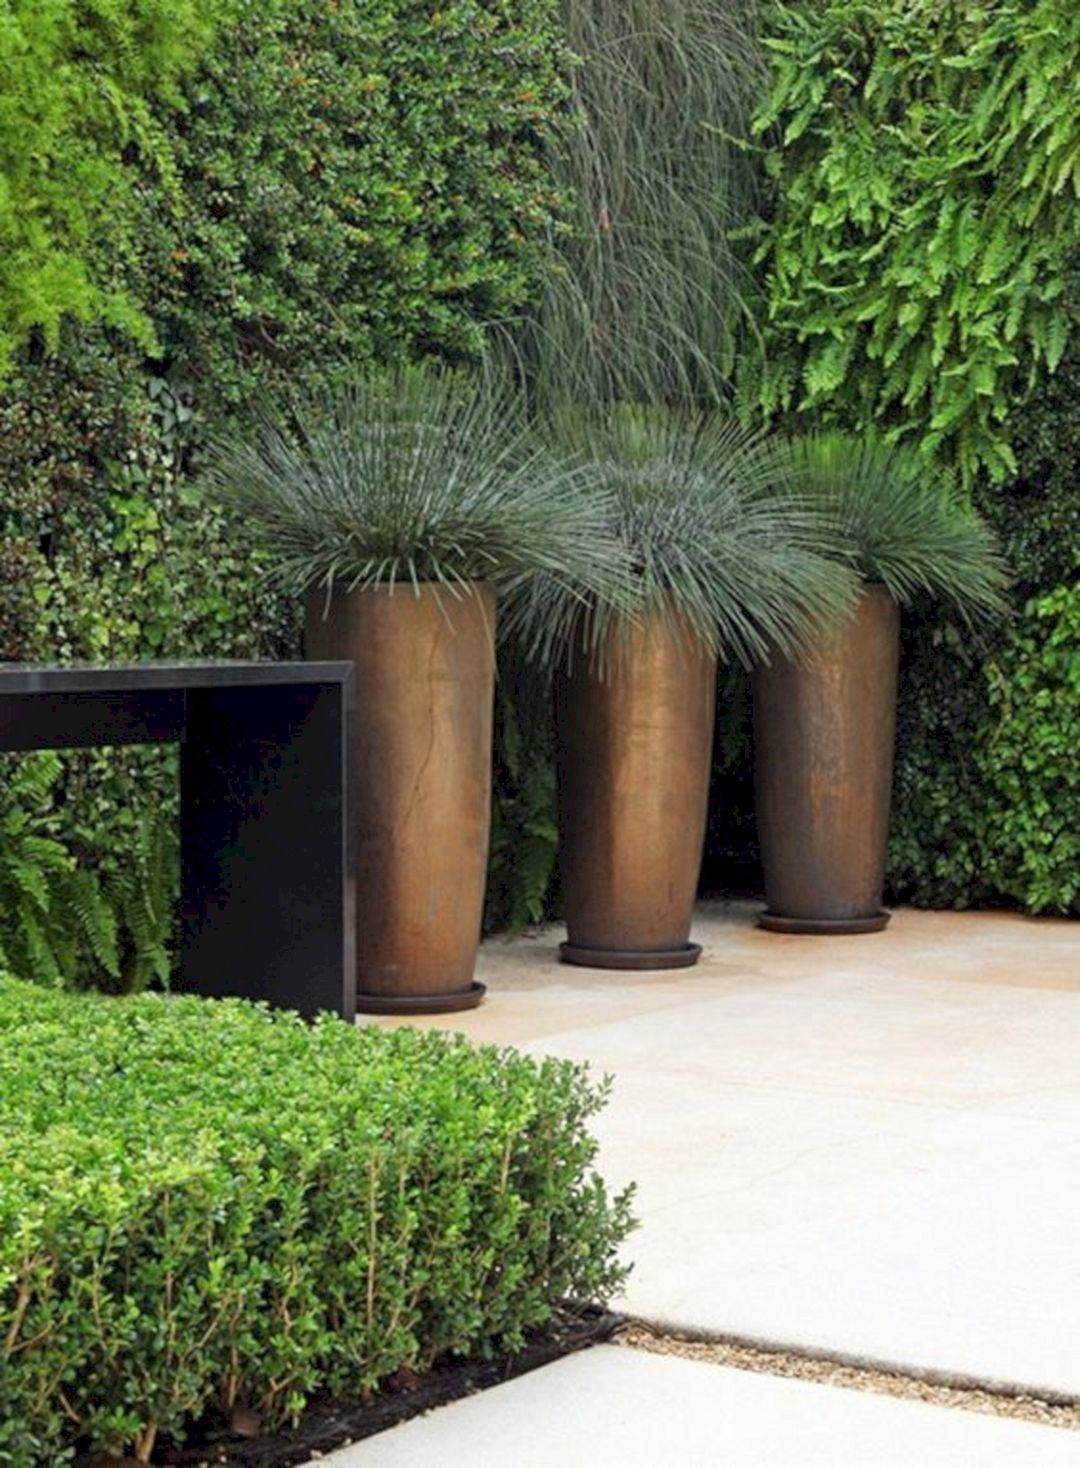 30 Best Contemporary Outdoor Planters Design For Beauty Home Ideas #contemporarygardendesign